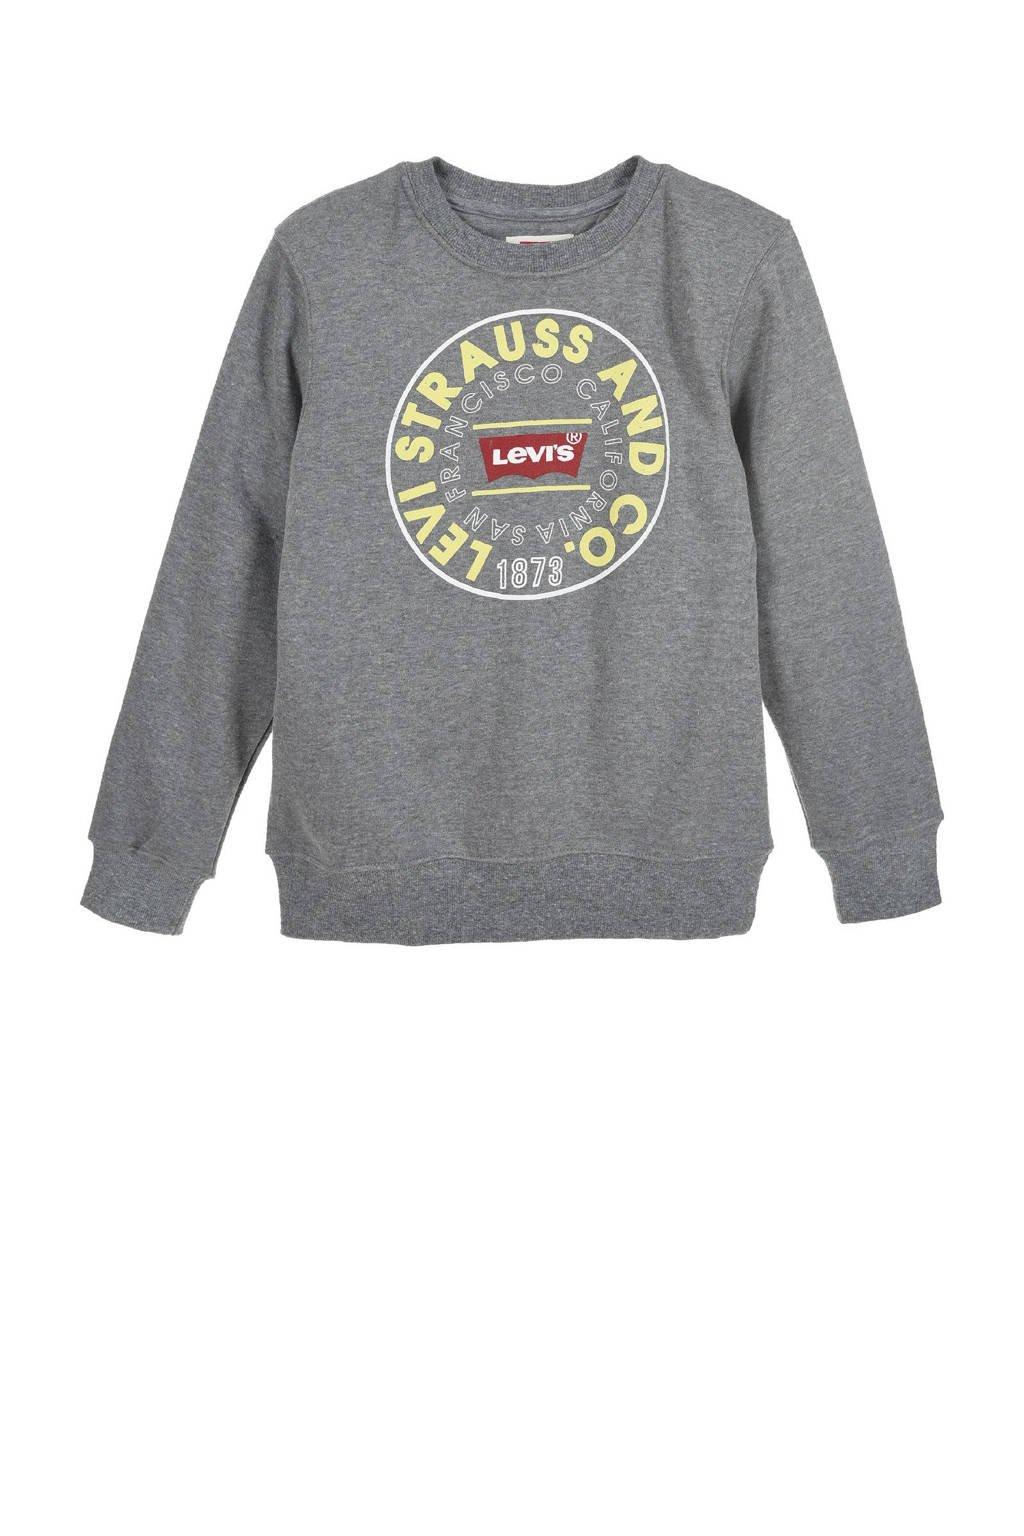 Levi's Kids sweater met logo donkergrijs melange, Donkergrijs melange